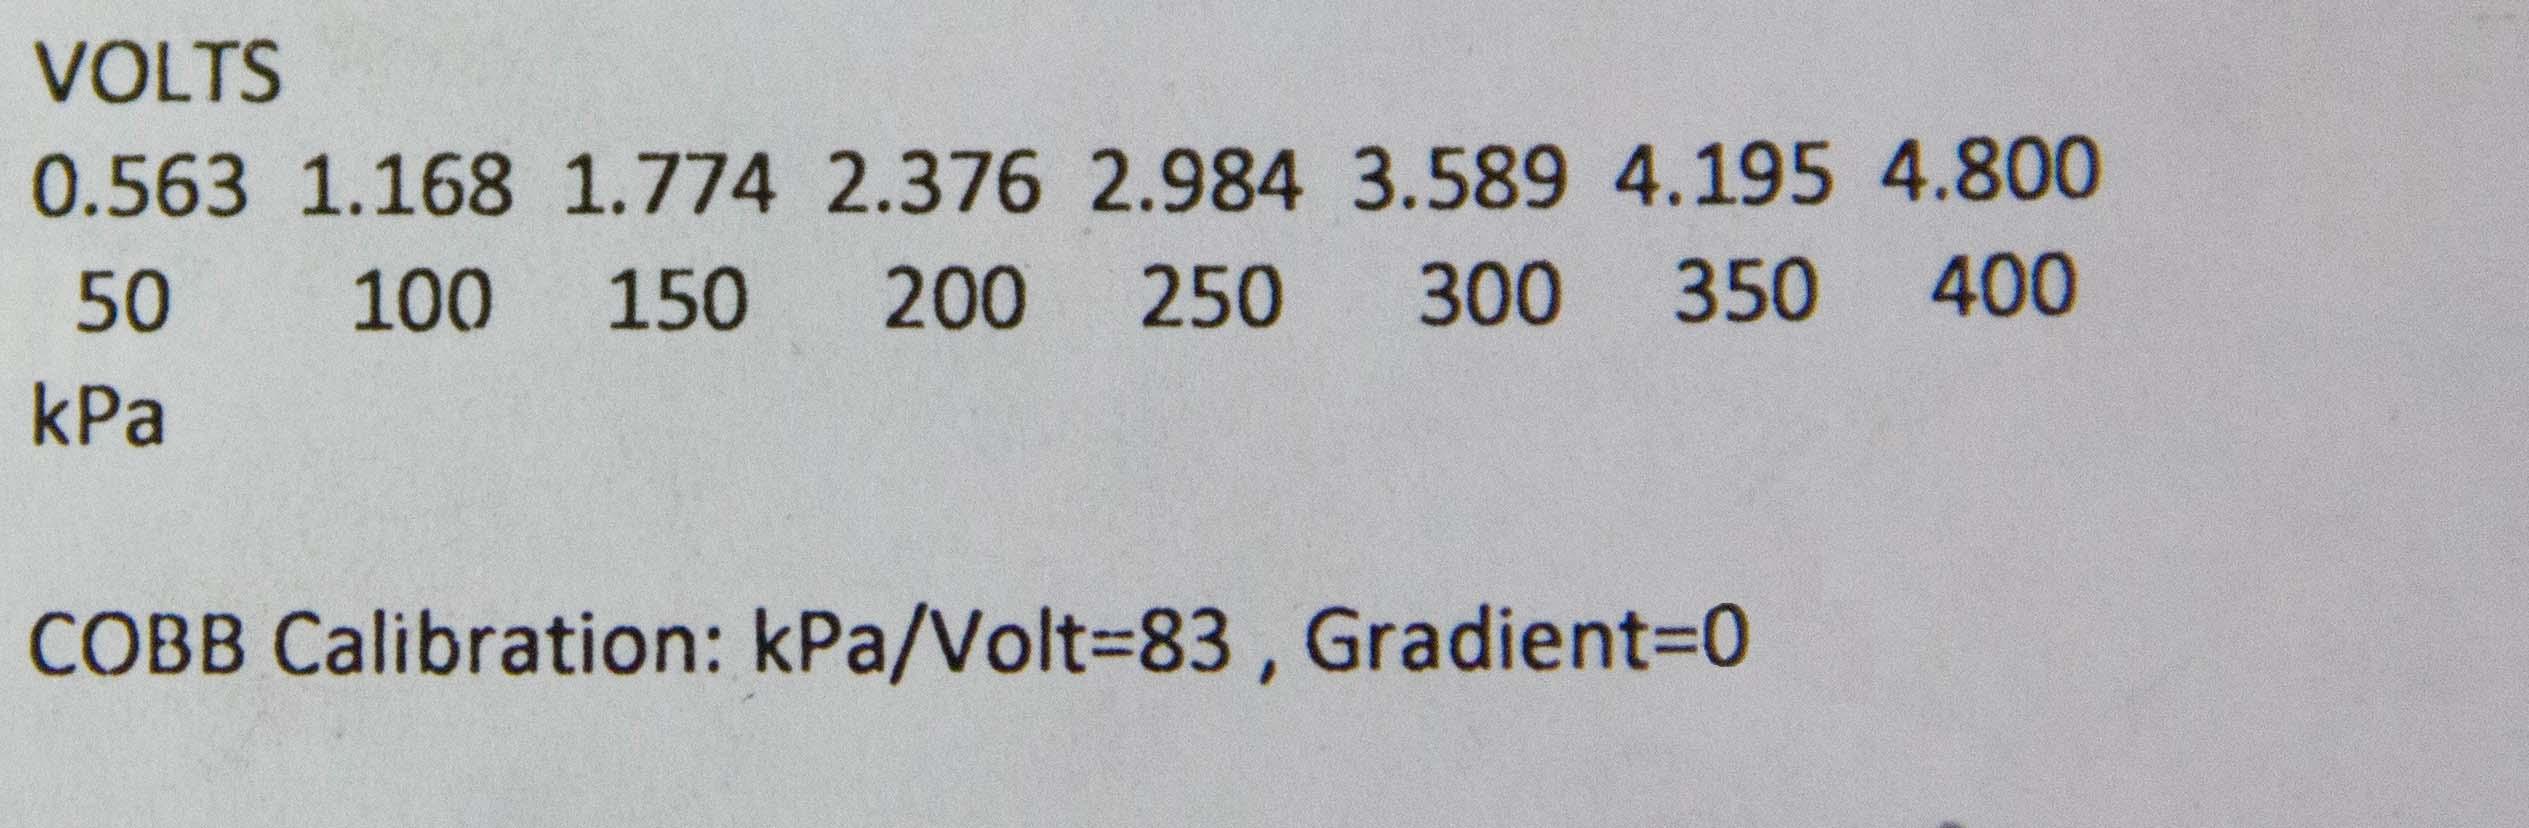 calibrations.jpg